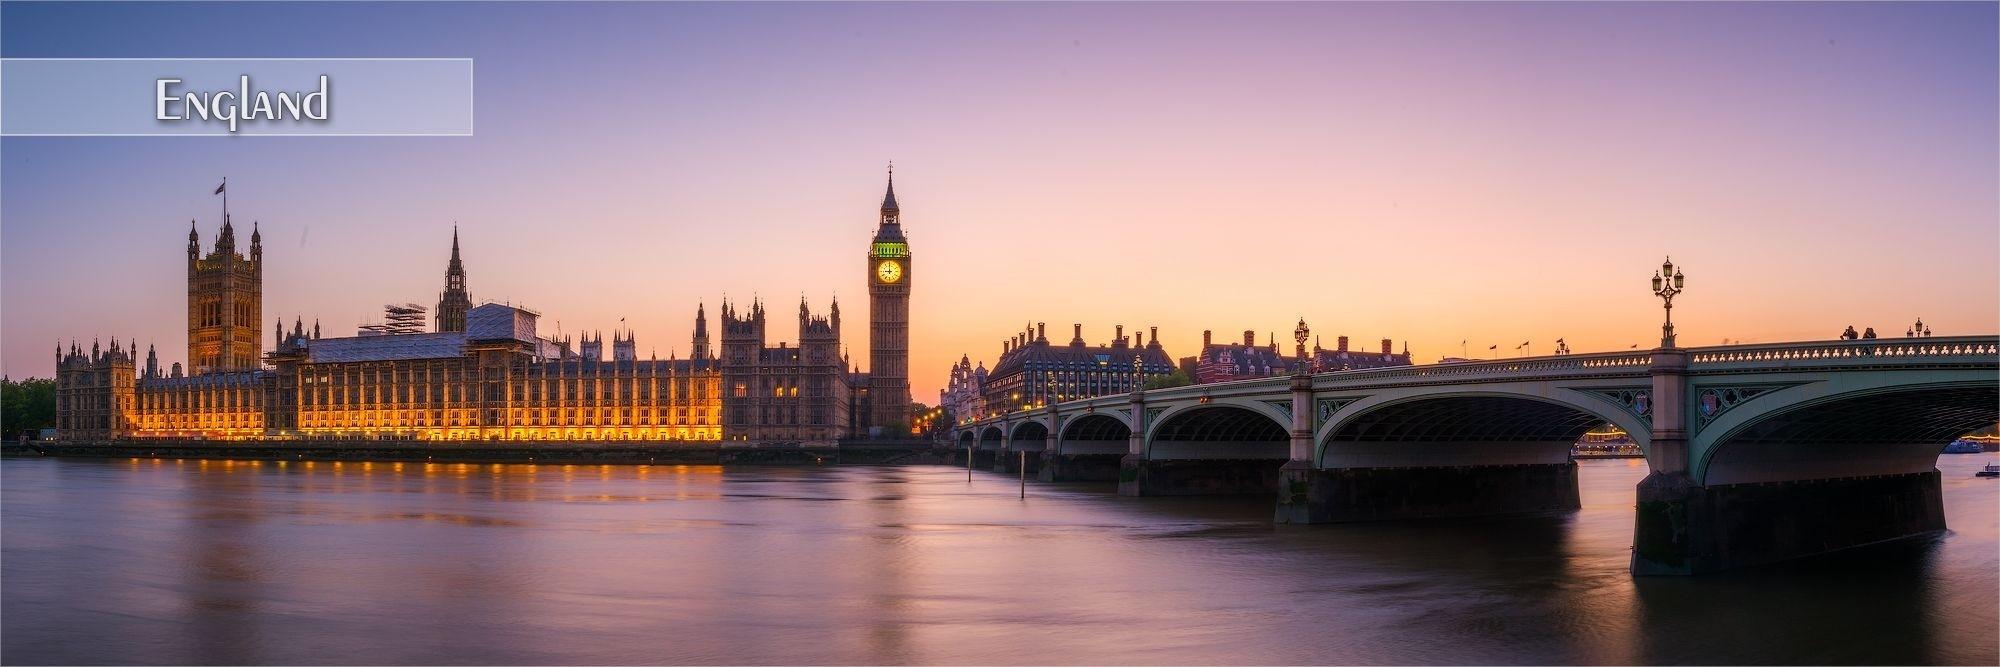 Bilder aus England als Wandbild oder Küchenrückwand